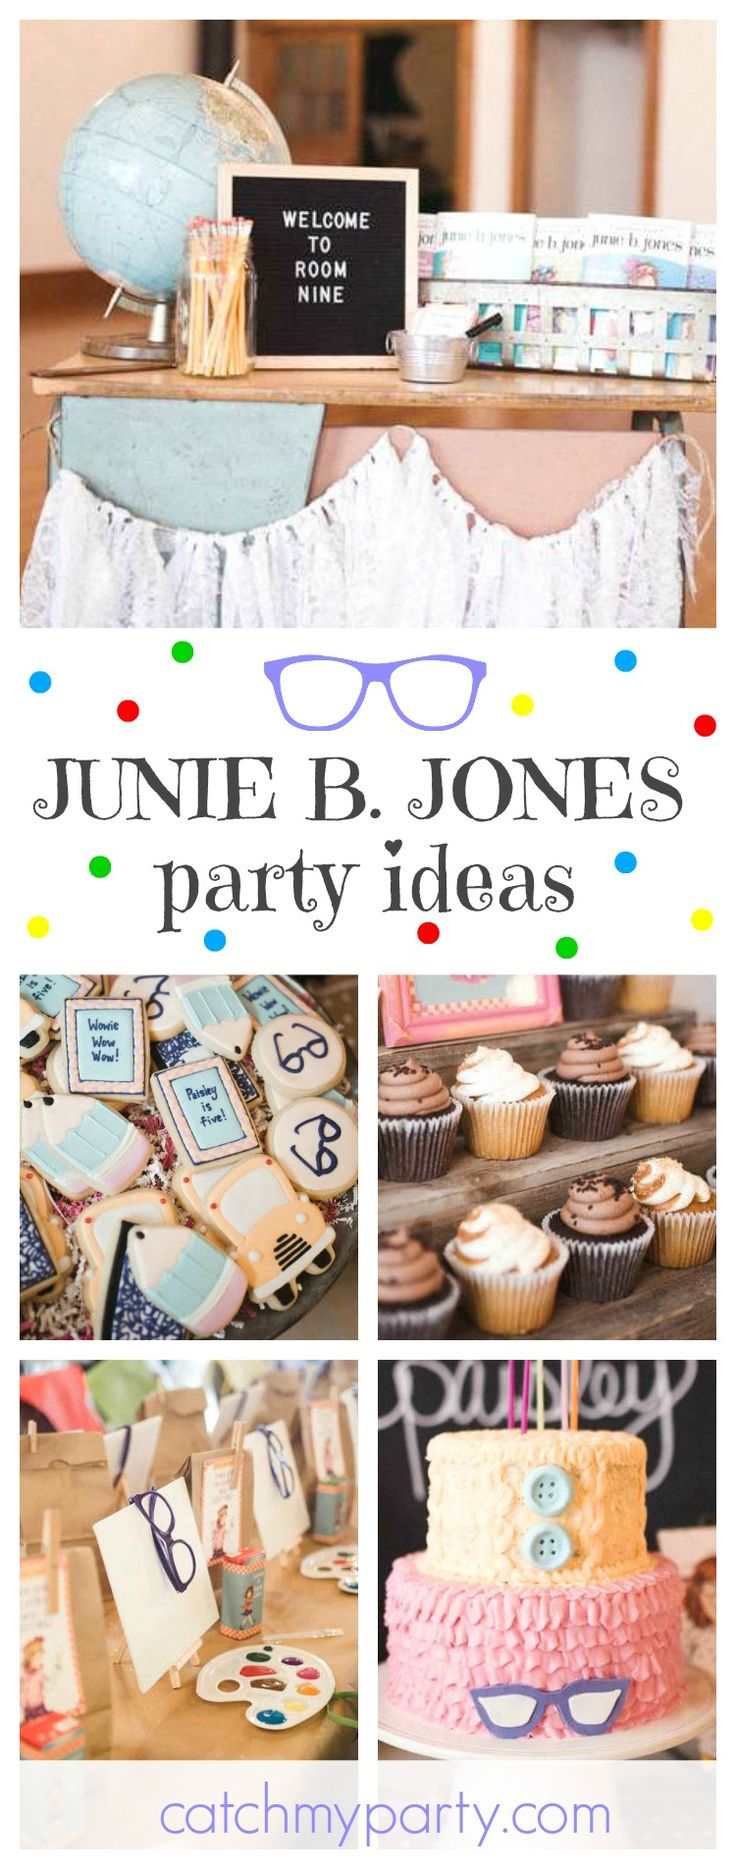 junie b jones Junie b jones seussville random house home books games activities characters author/illustrator kids' club reviews parents teachers oh no you need to.